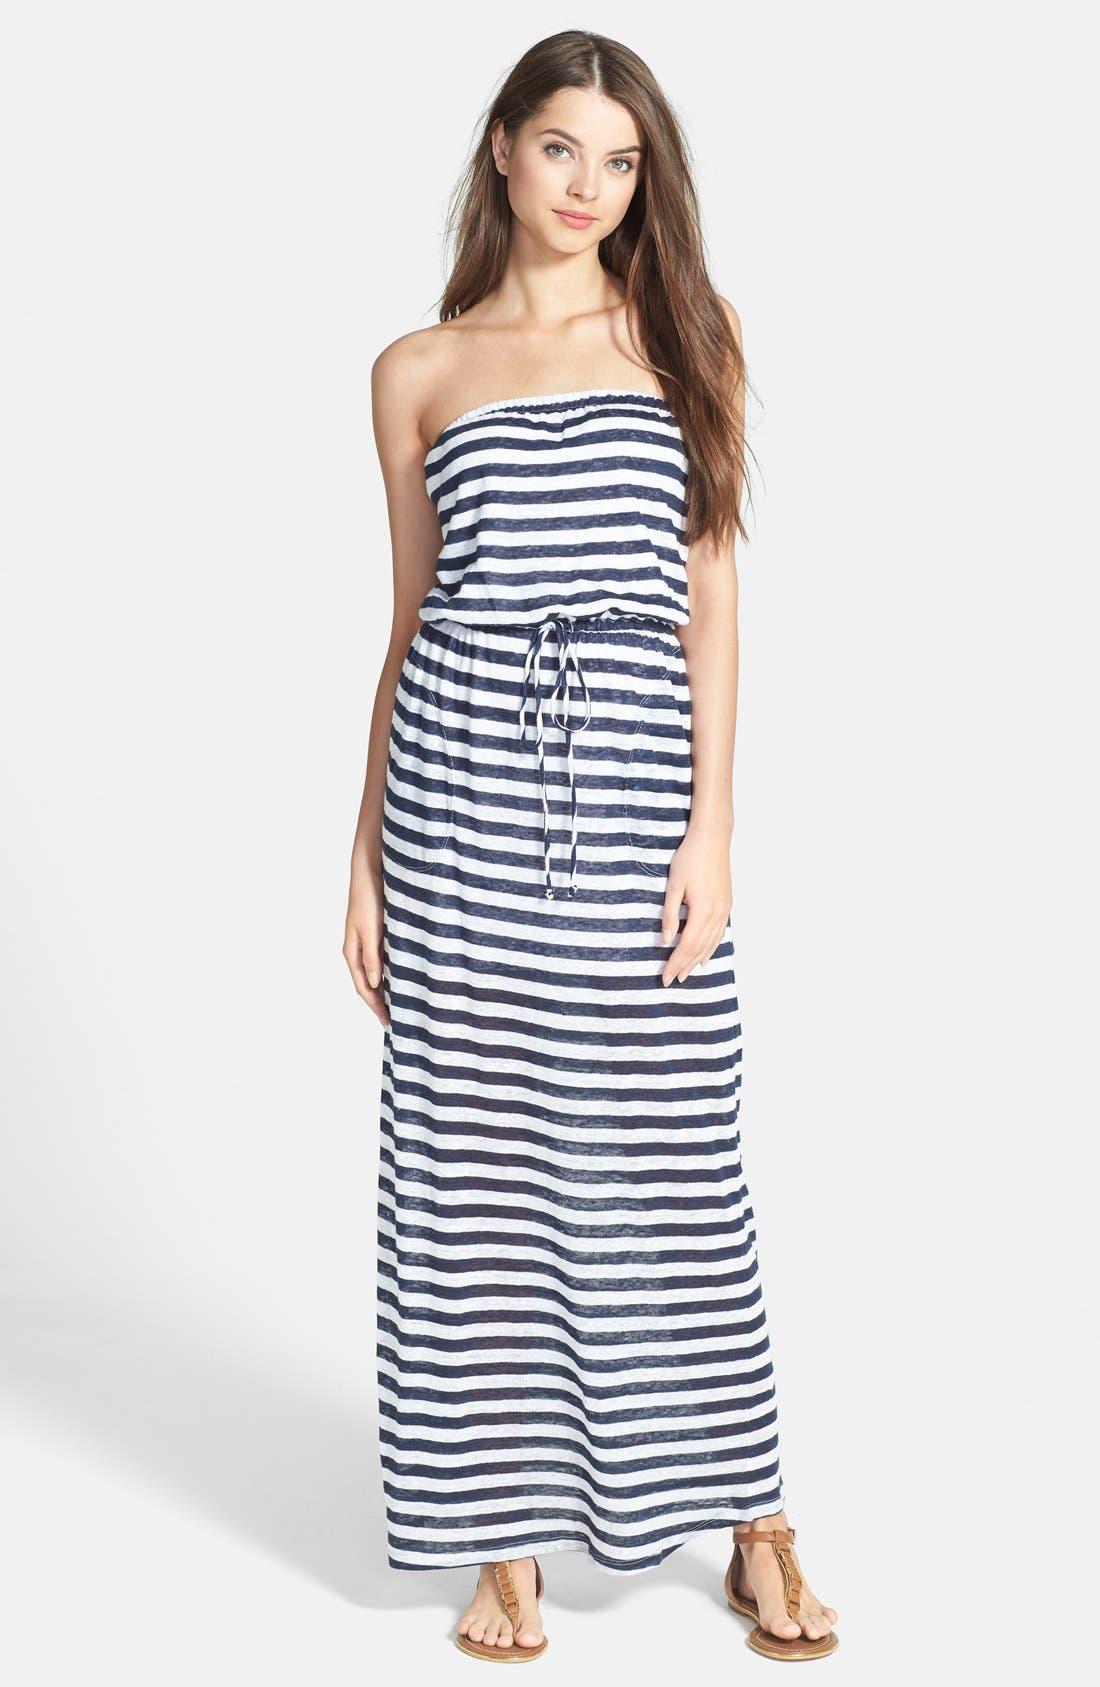 Alternate Image 1 Selected - C & C California Stripe Linen Jersey Maxi Dress